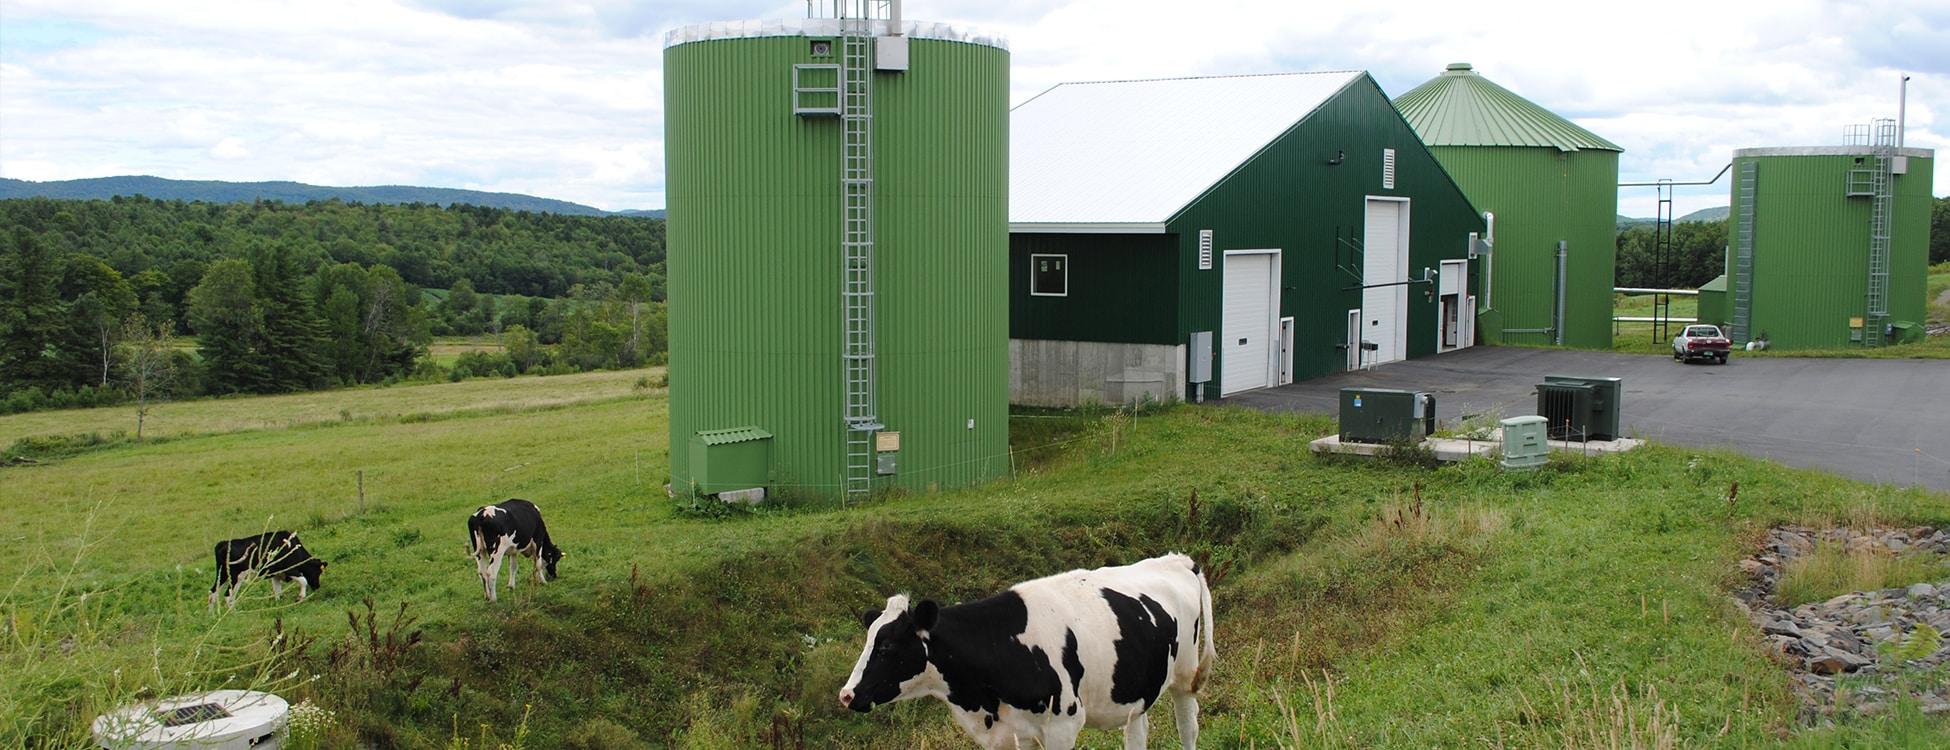 Vermont Tech's digester, cows, Randolph Center campus